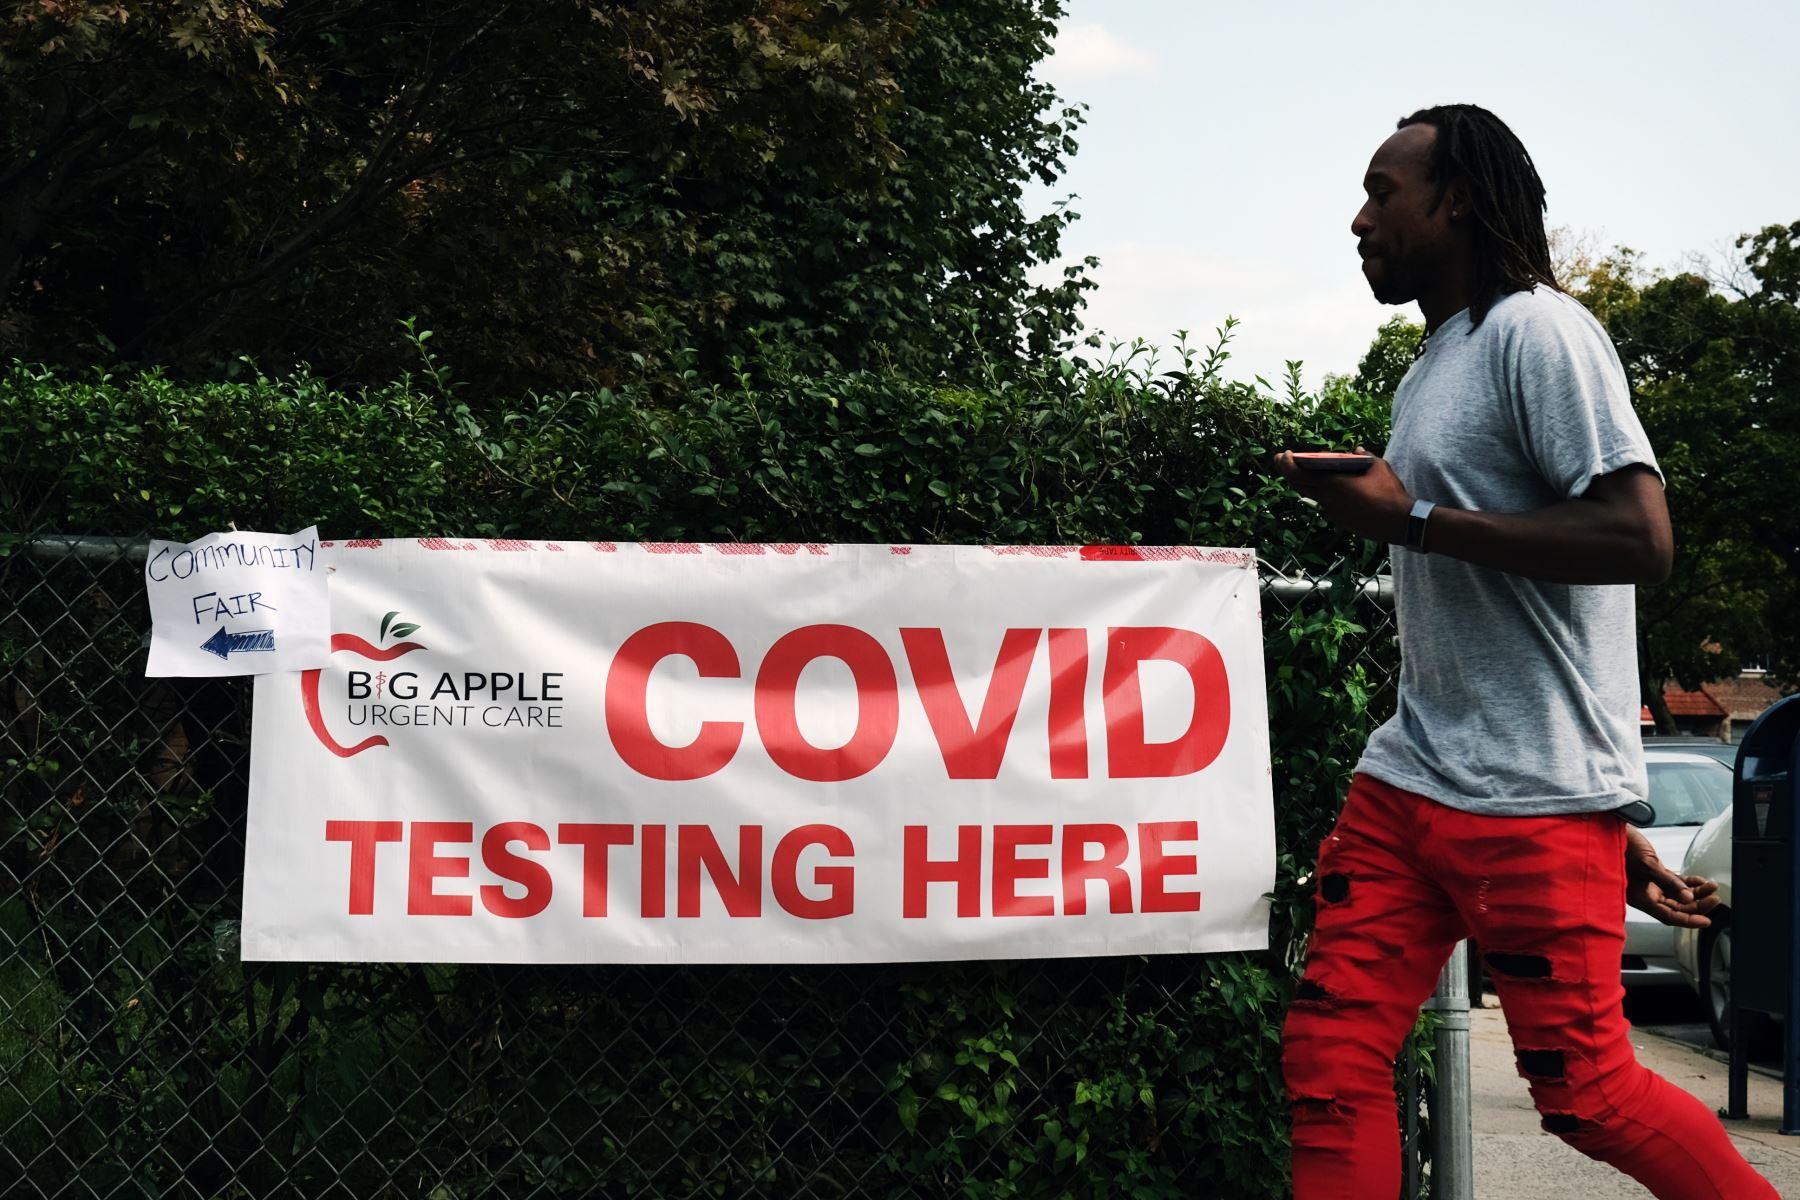 EE. UU. bate récord de contagios de covid-19 por tercer día consecutivo